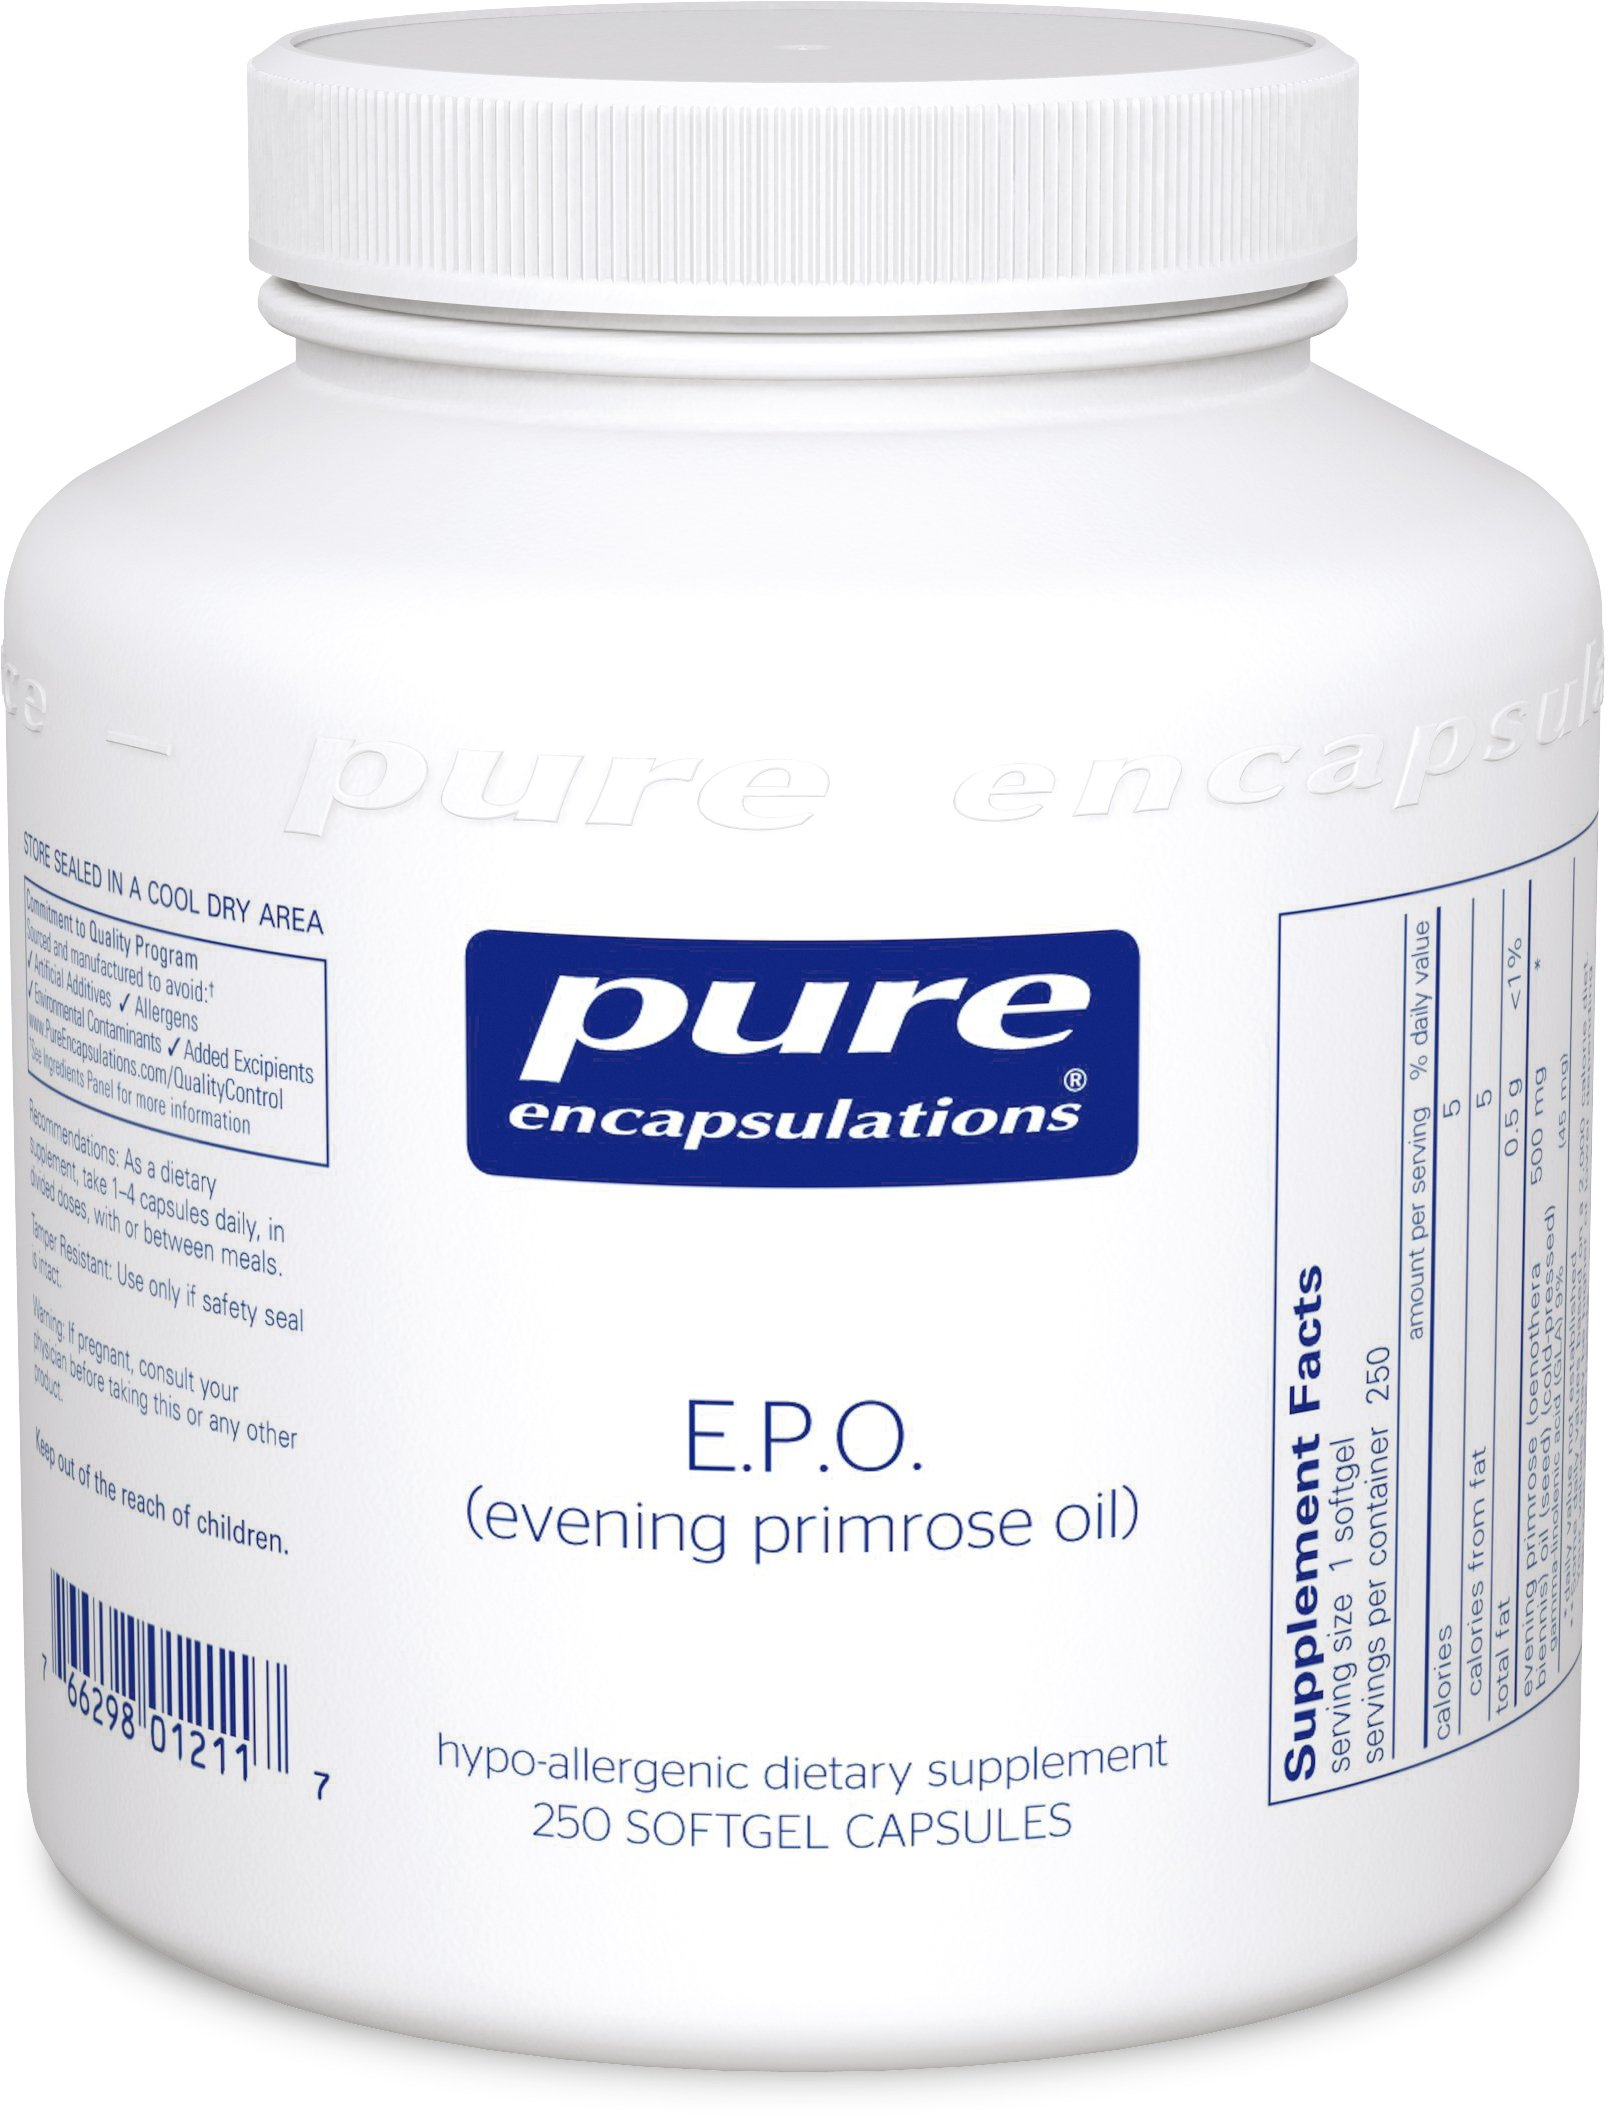 Pure Encapsulations - E.P.O. (Evening Primrose Oil) - Hypoallergenic Dietary Supplement Containing 9% GLA - 250 Softgel Capsules